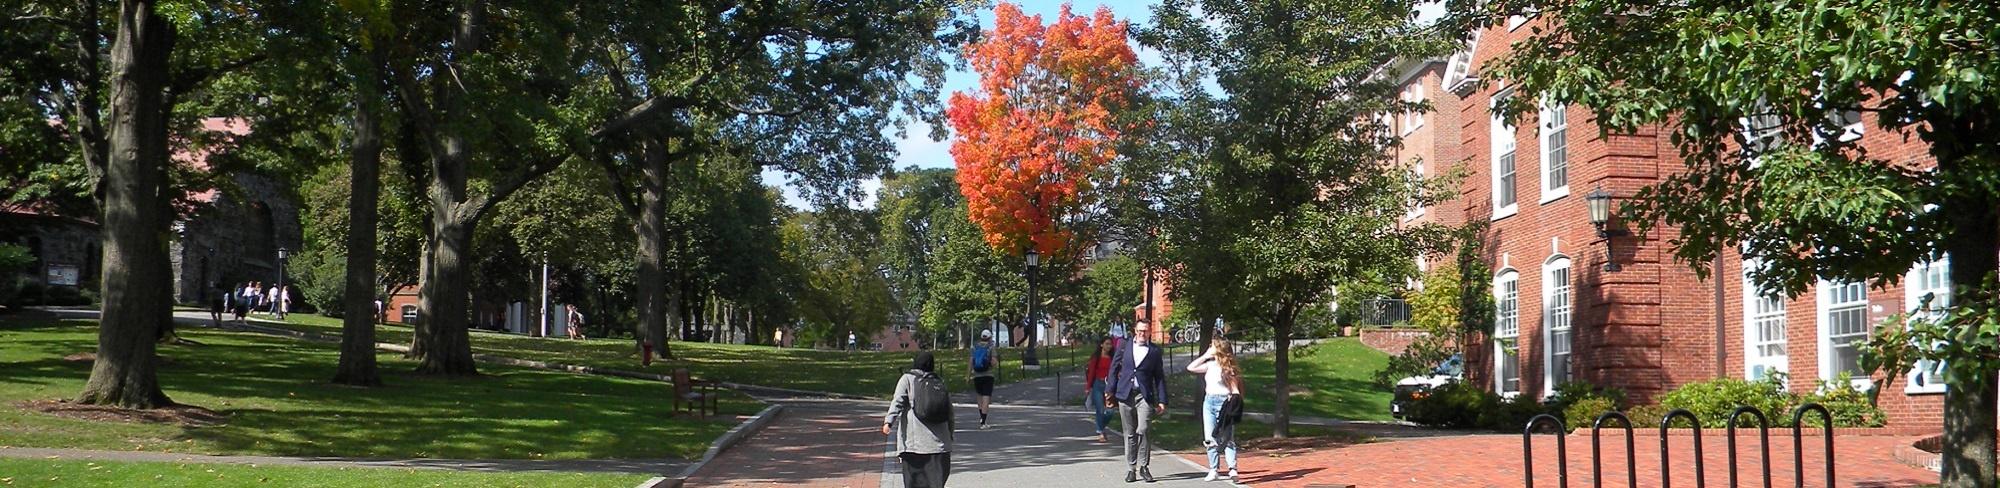 On_campus.caption.jpg